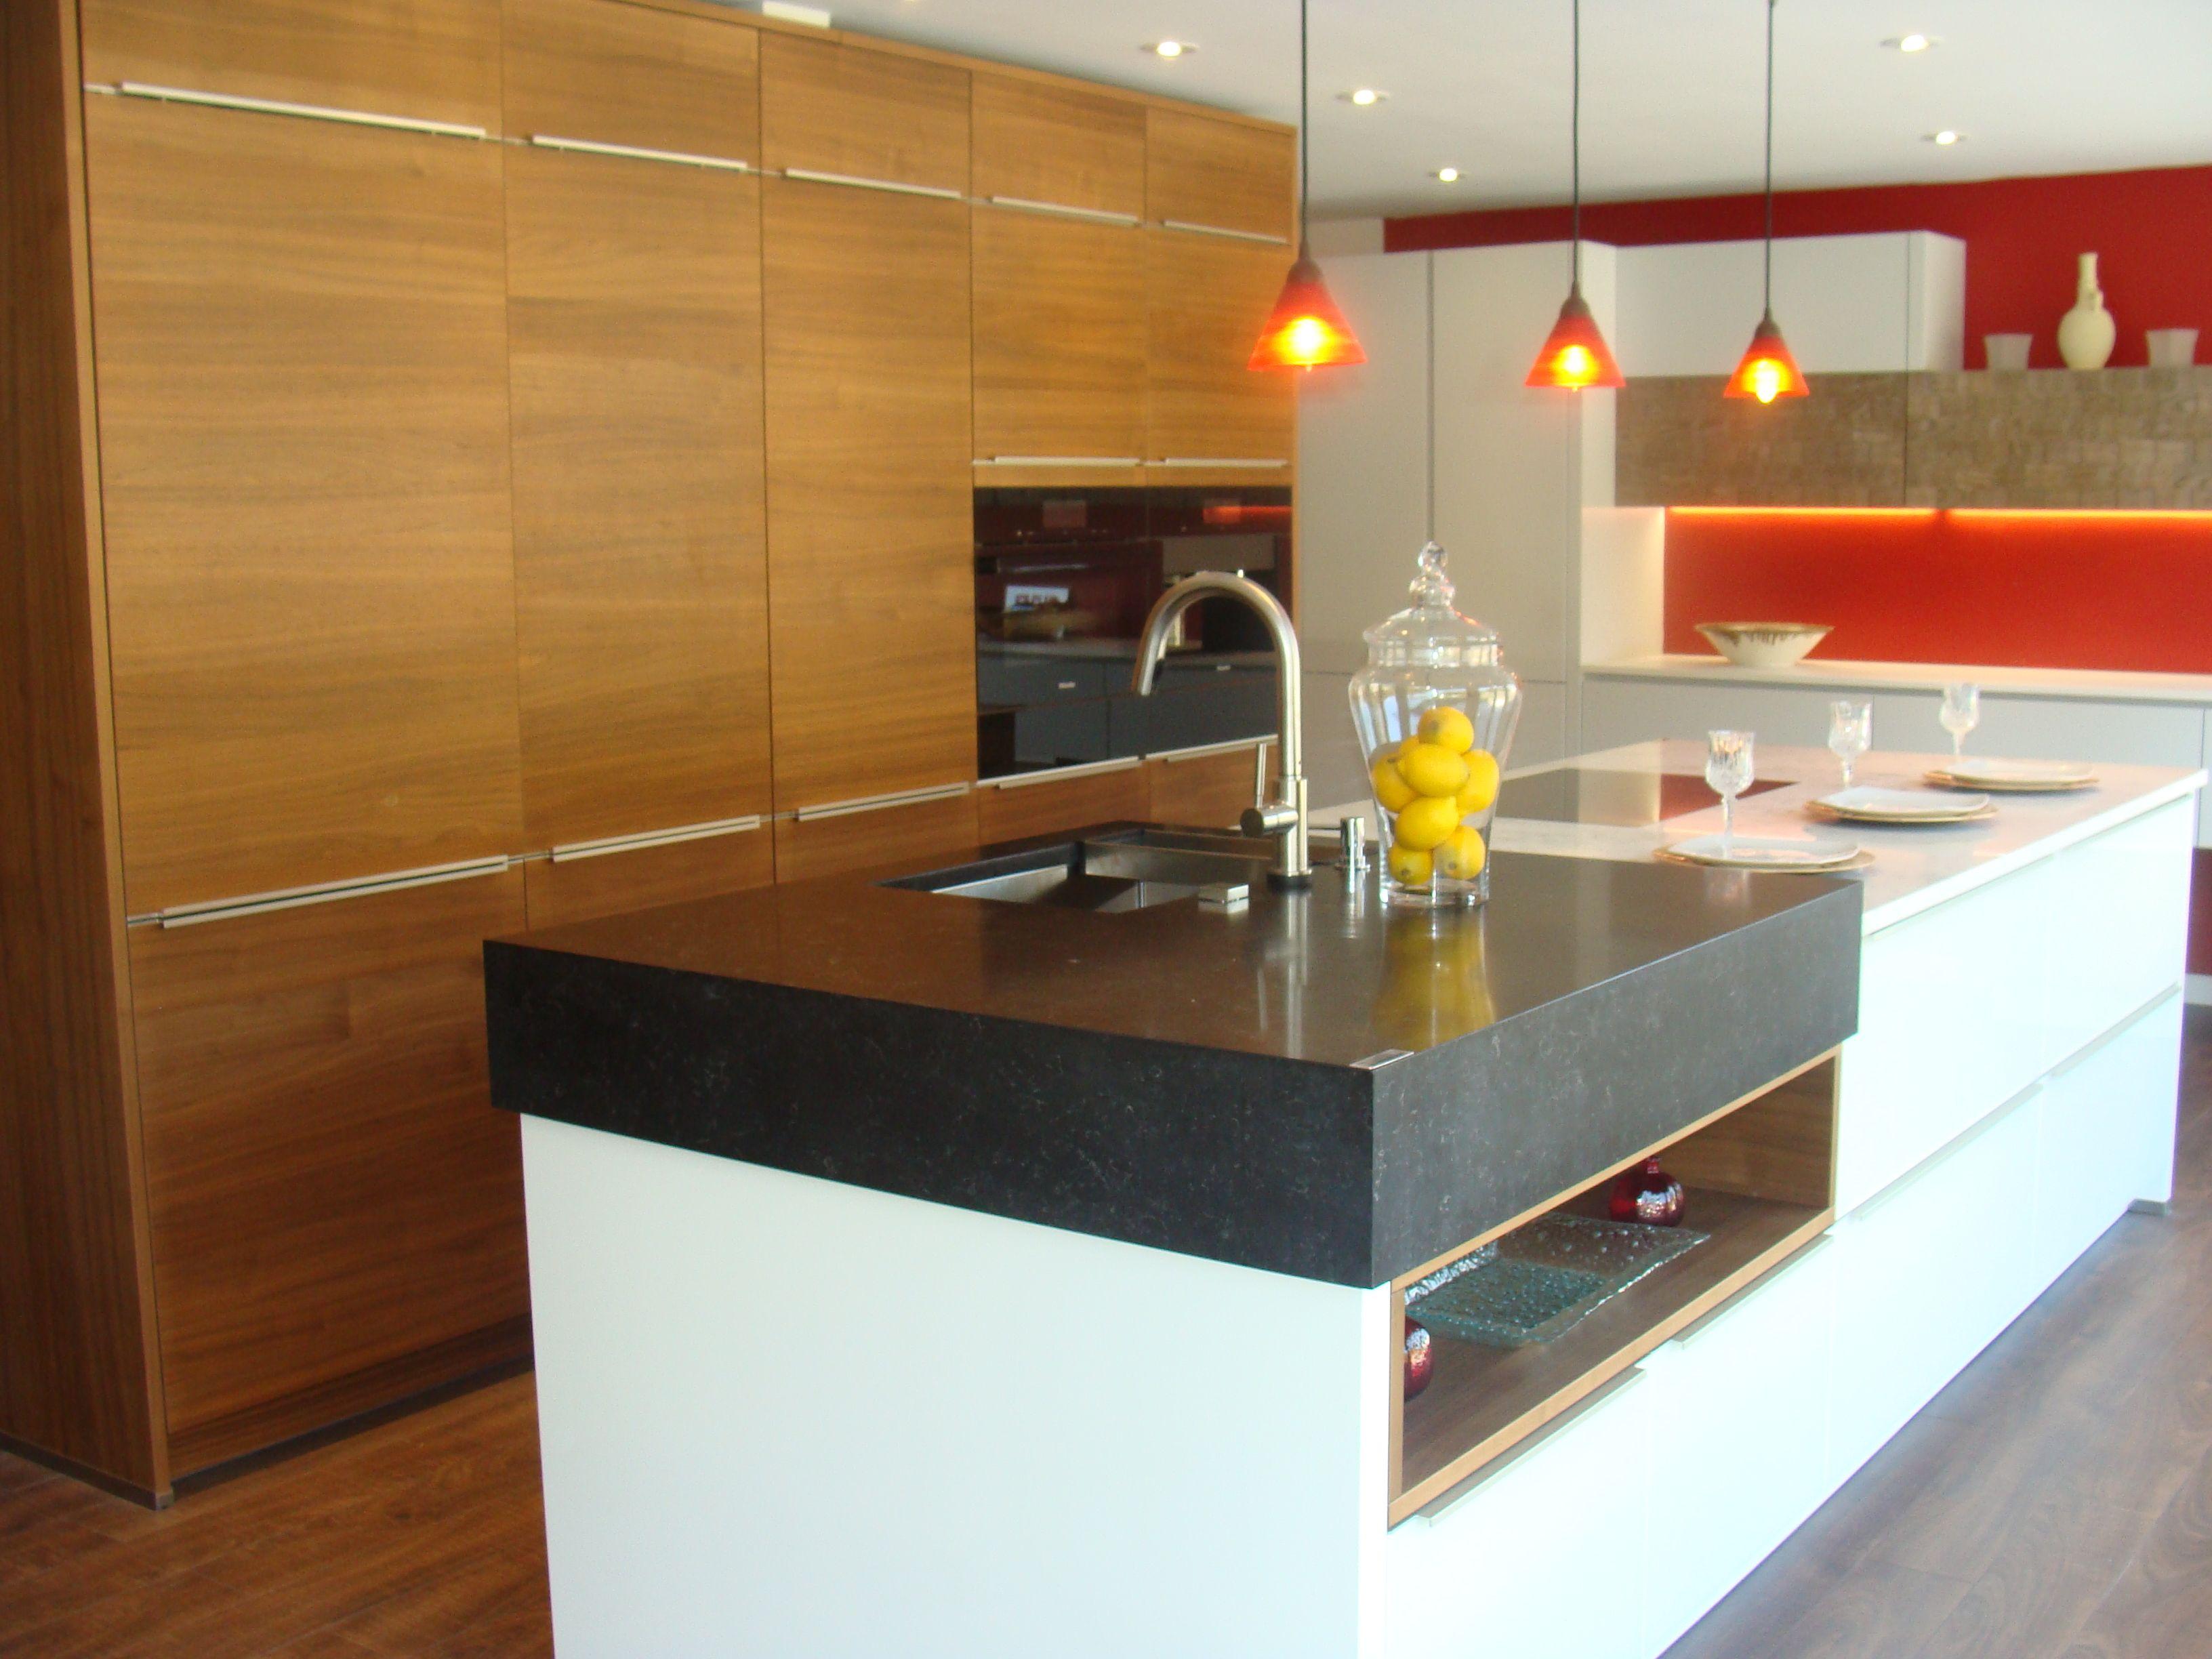 Alnoclass Walnut Horizontal Wood Grain By Alno Kitchen Design Companies Cabinetry Design Custom Kitchens